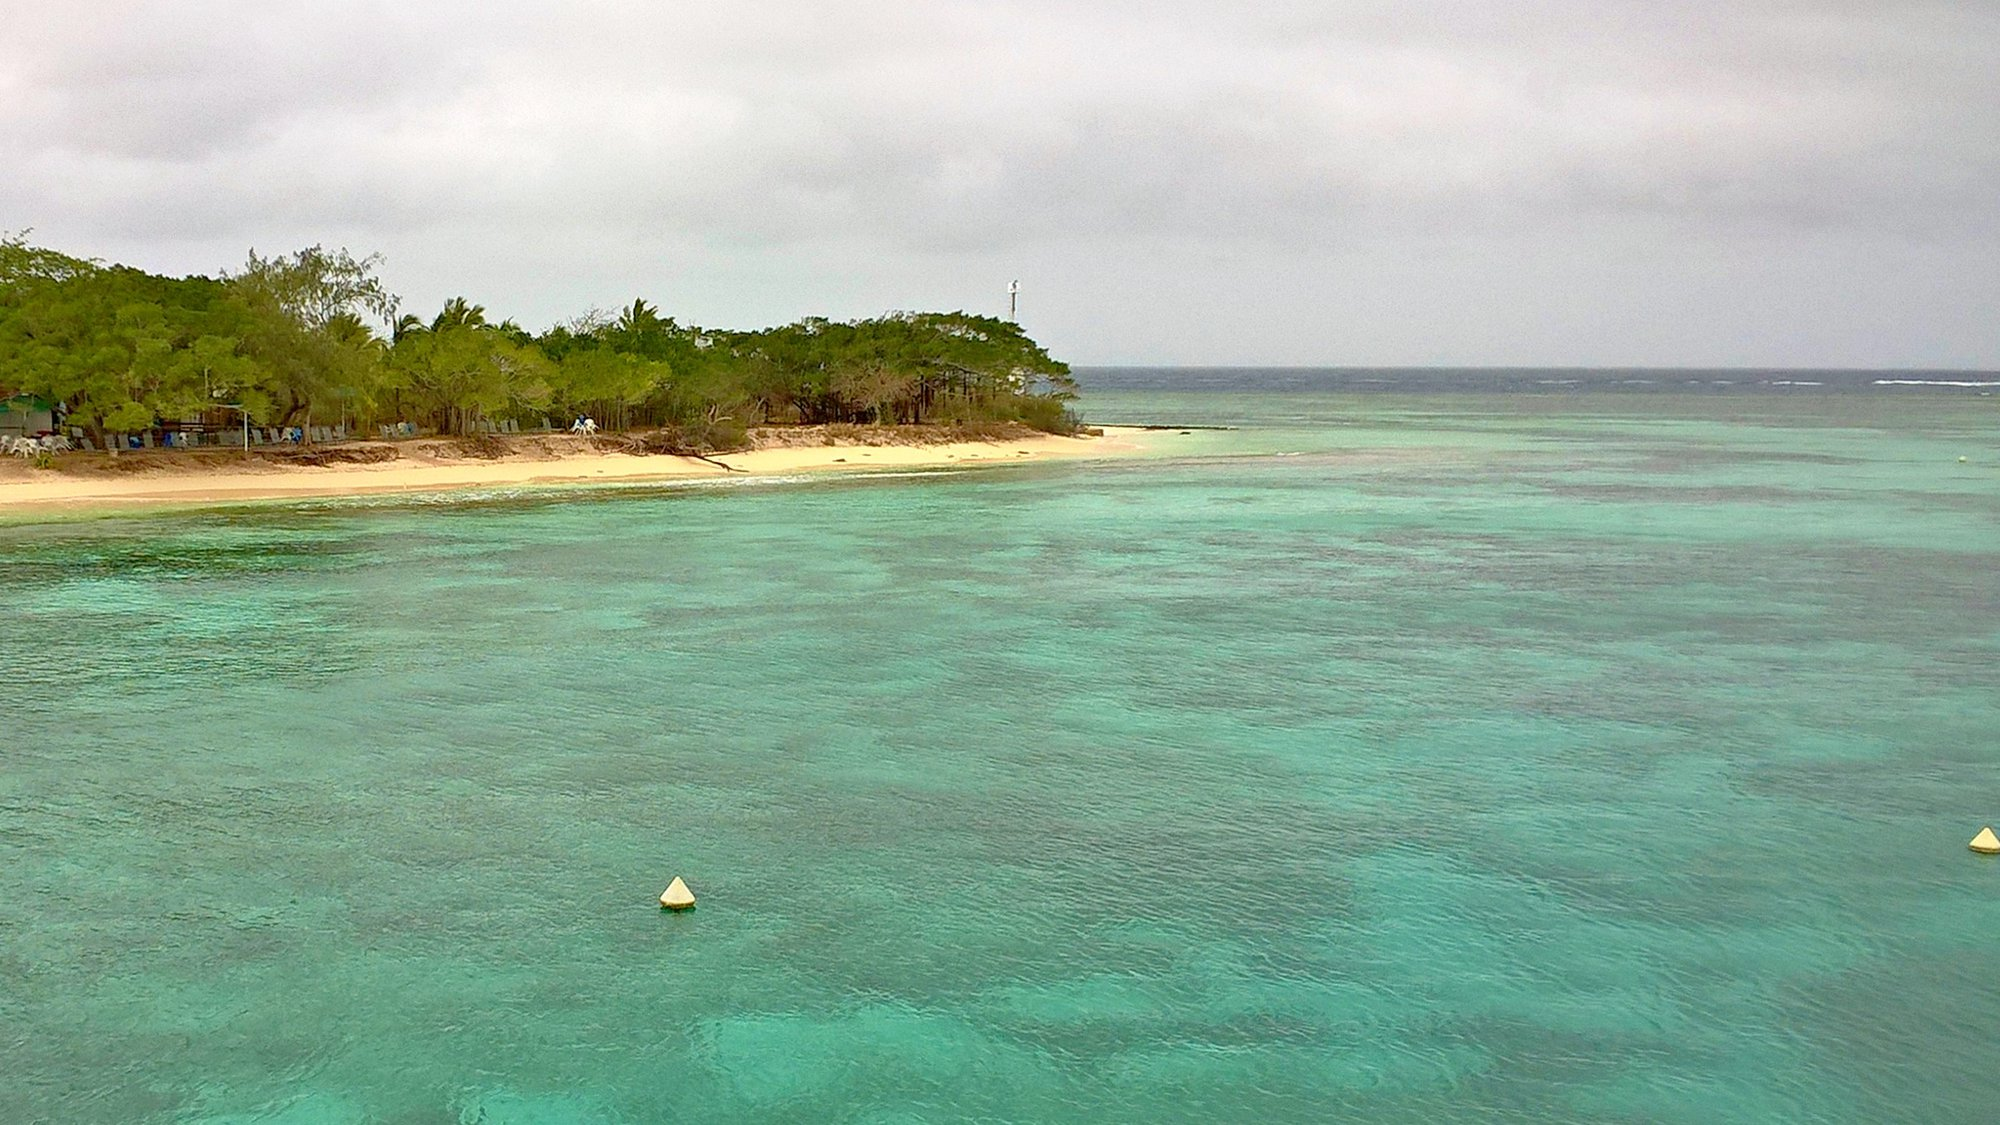 laguna okolo ostrova Amedée